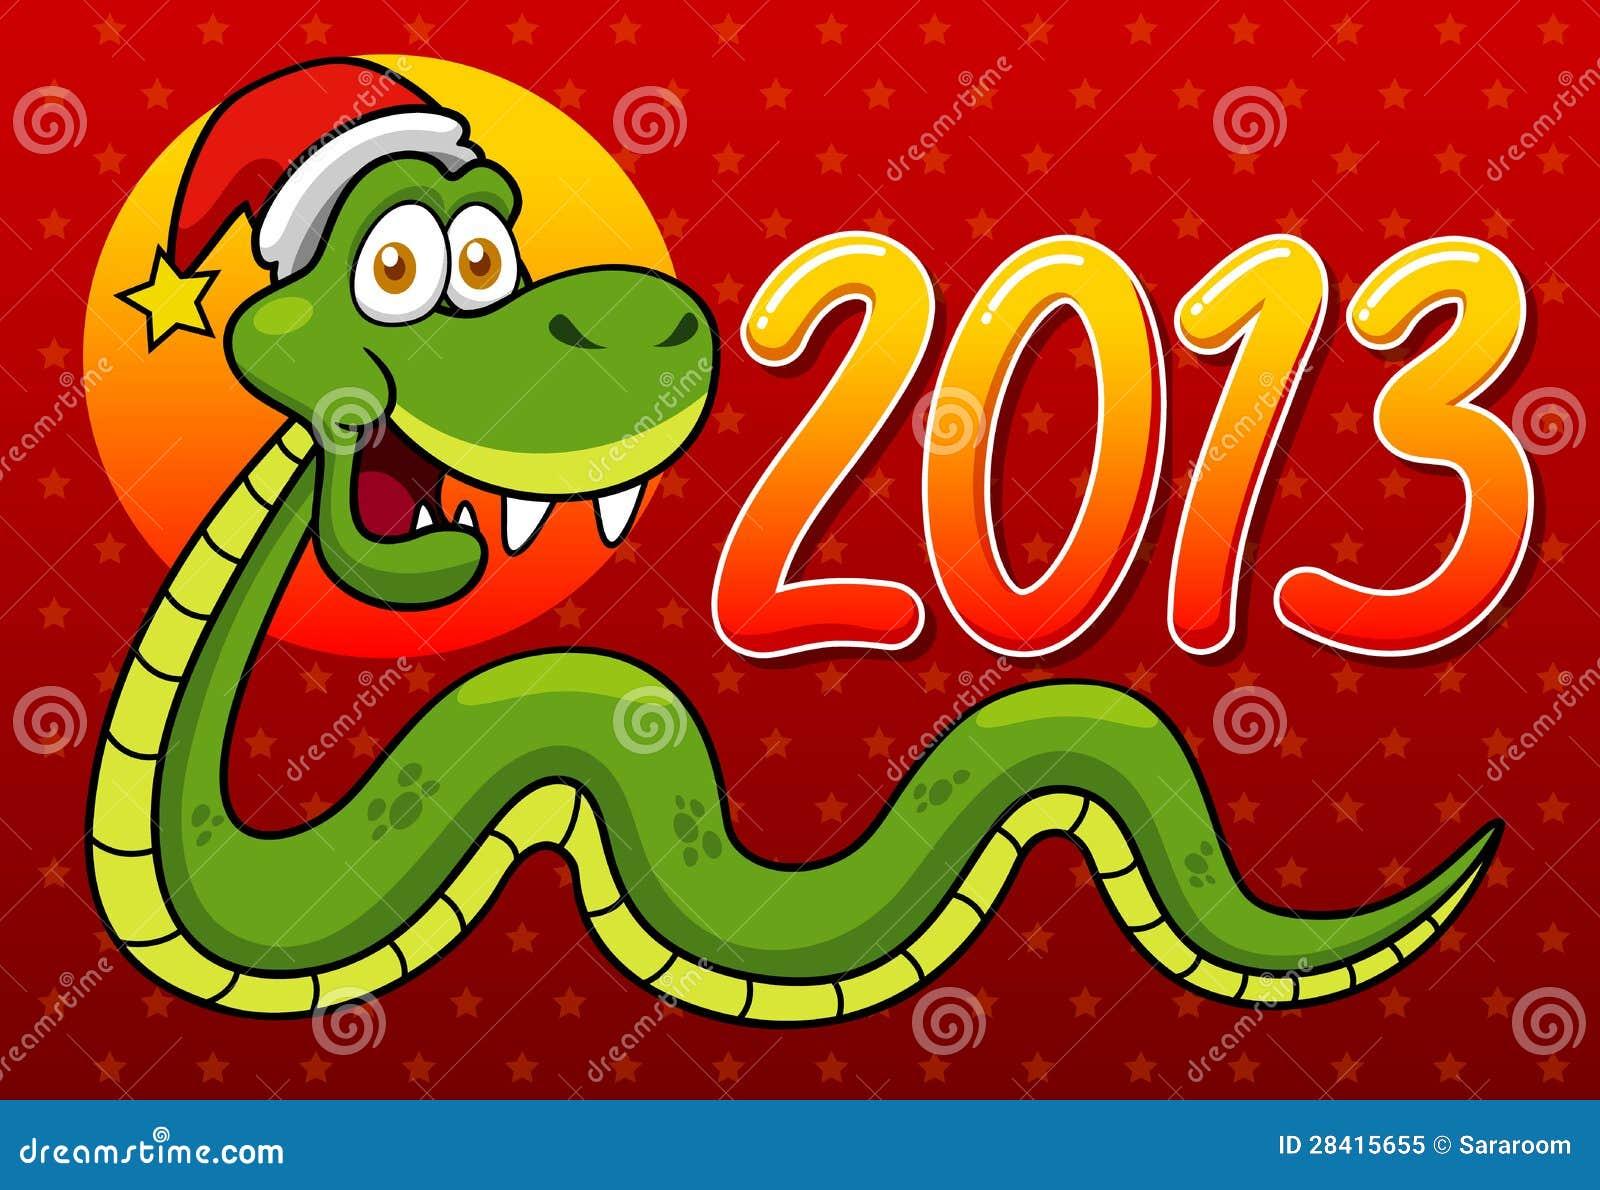 Green snake cartoon royalty free stock image image 19462406 - Cartoon Snake Royalty Free Stock Photo Image 28415655 Wallpaper Gallery Snake In Bottle Cartoon Royalty